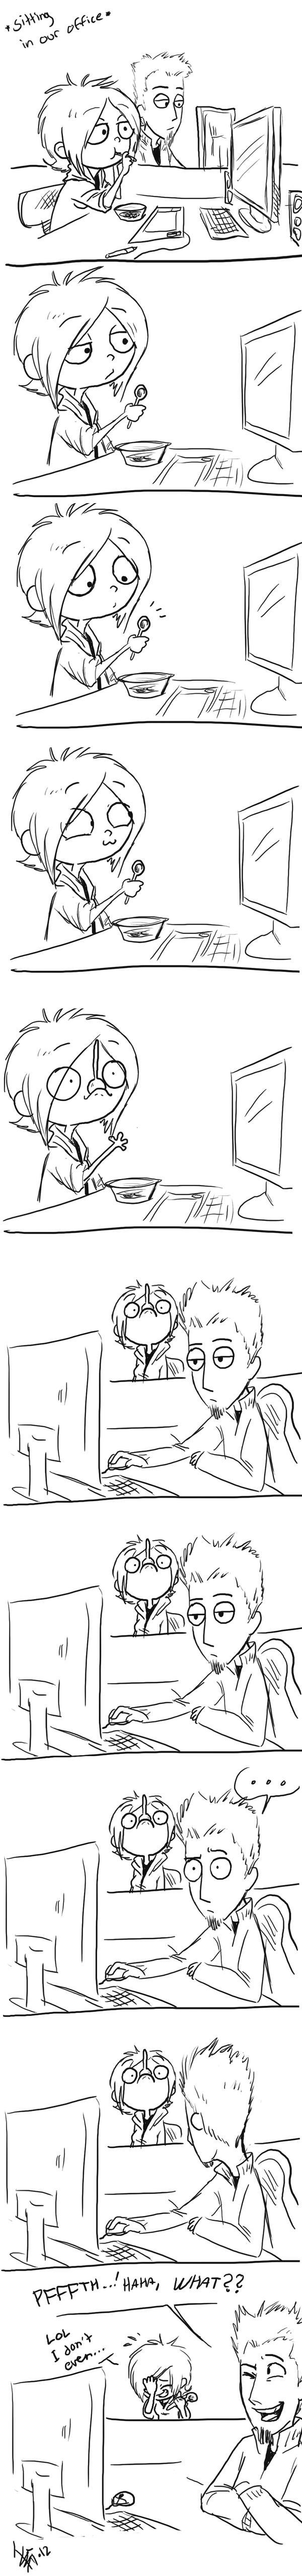 the spoon - comic by oomizuao